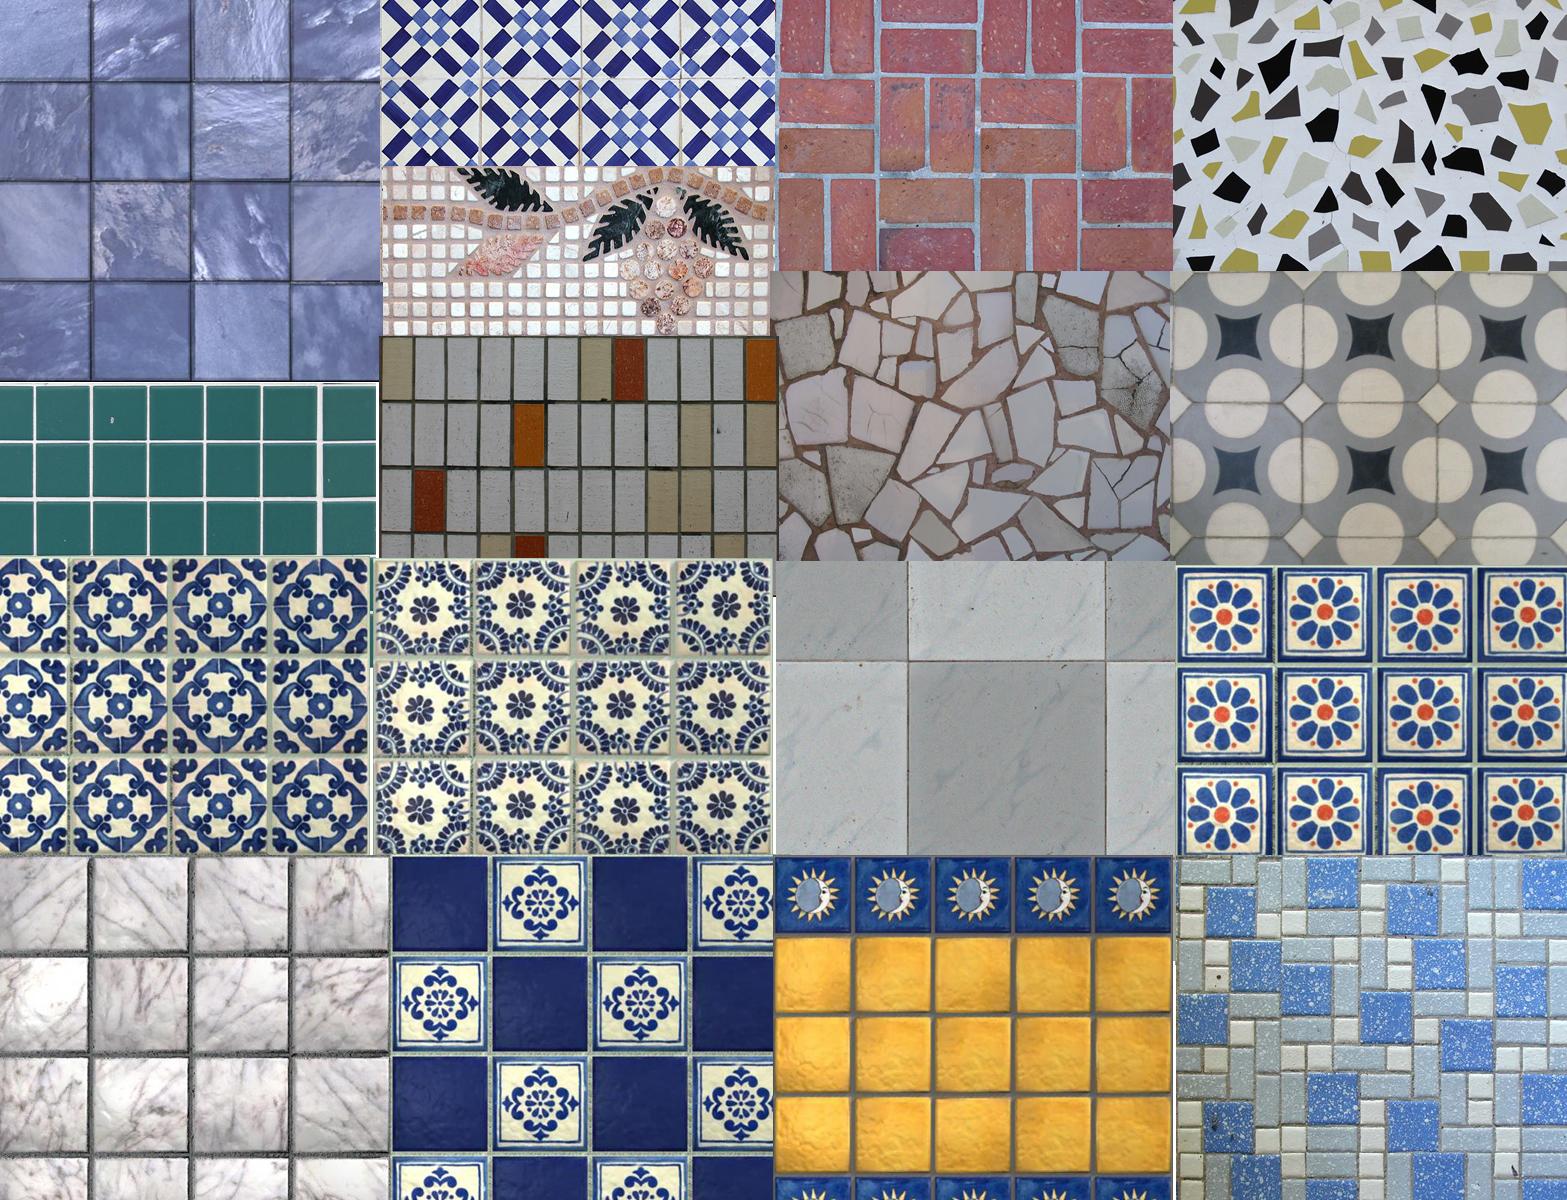 Texturas cerámica, en Pisos cerámicos – Texturas